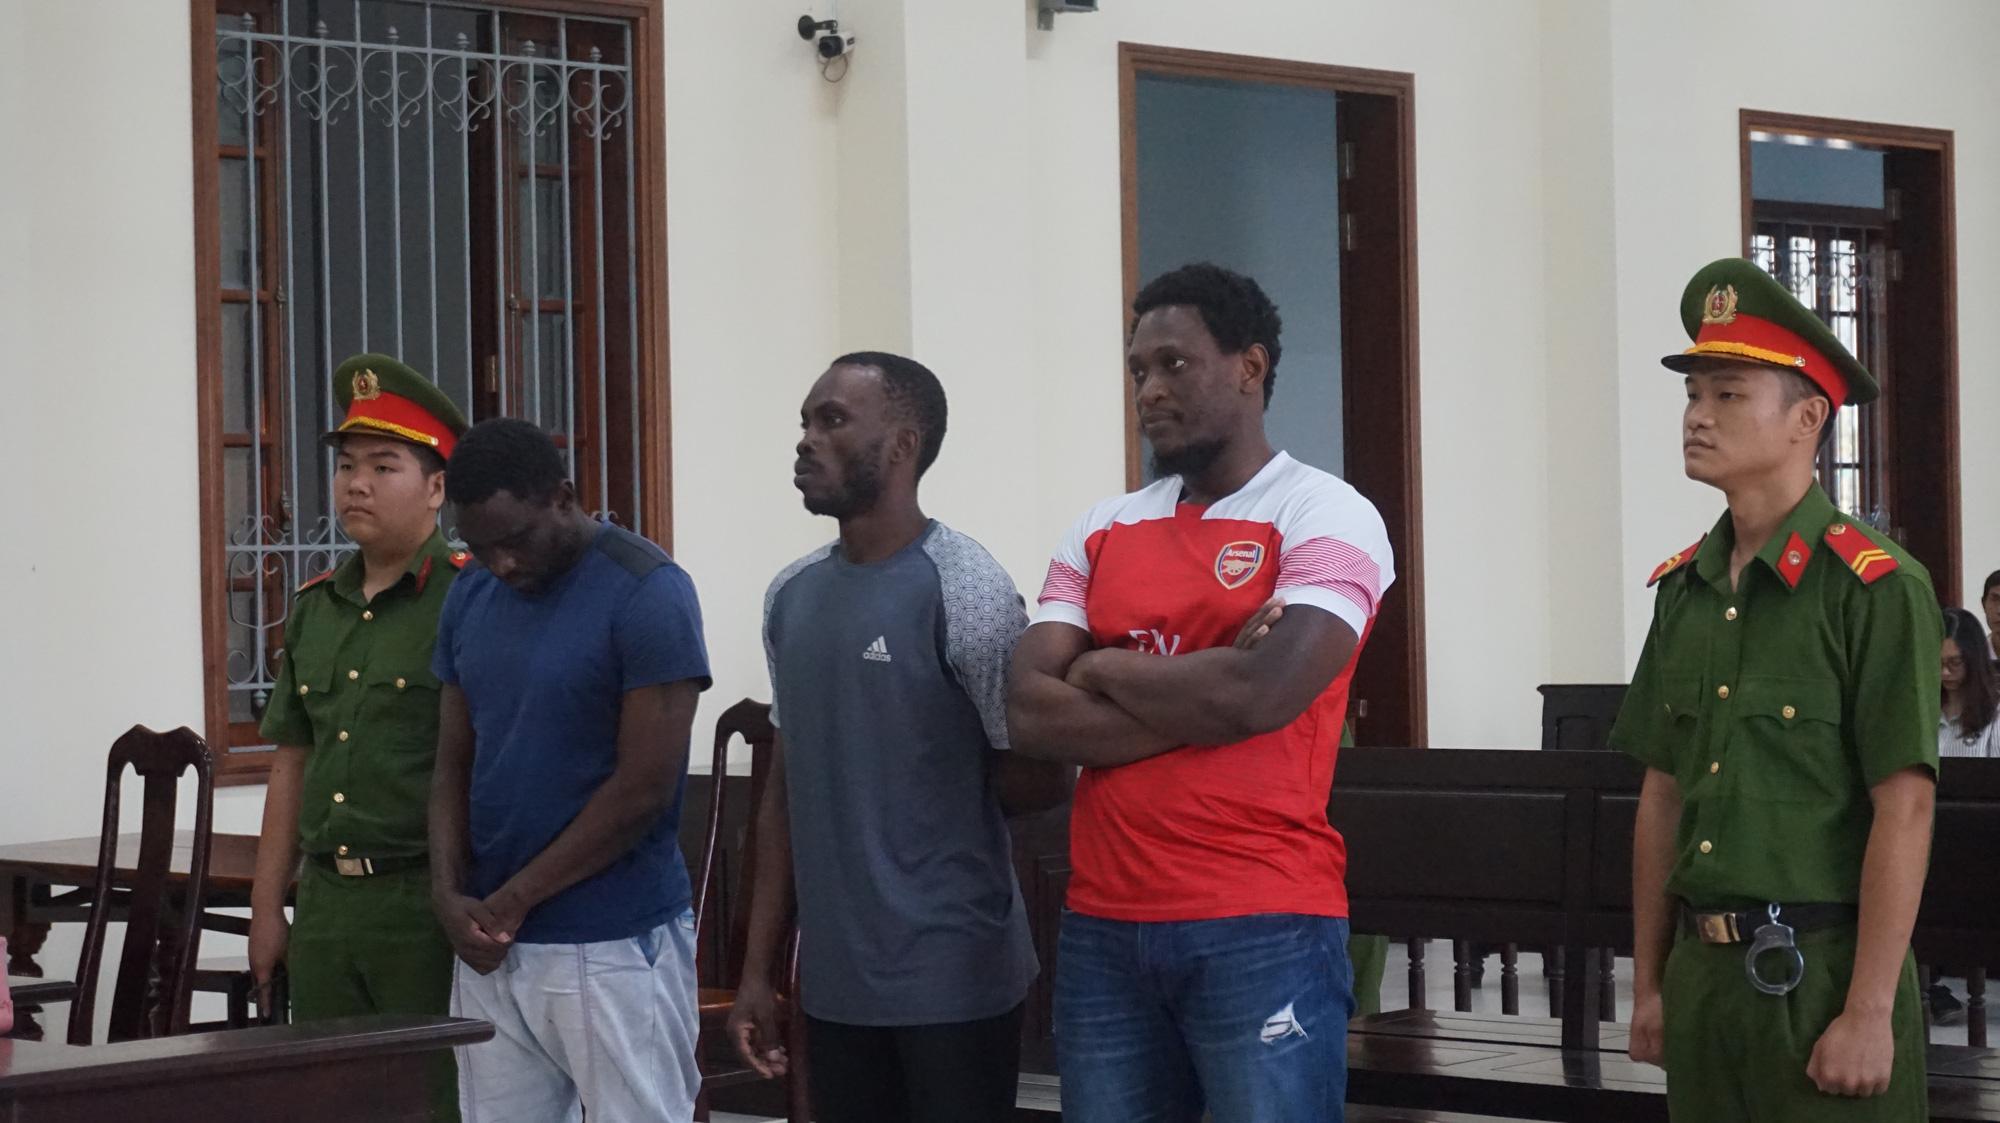 African men jailed for scamming Vietnamese women online